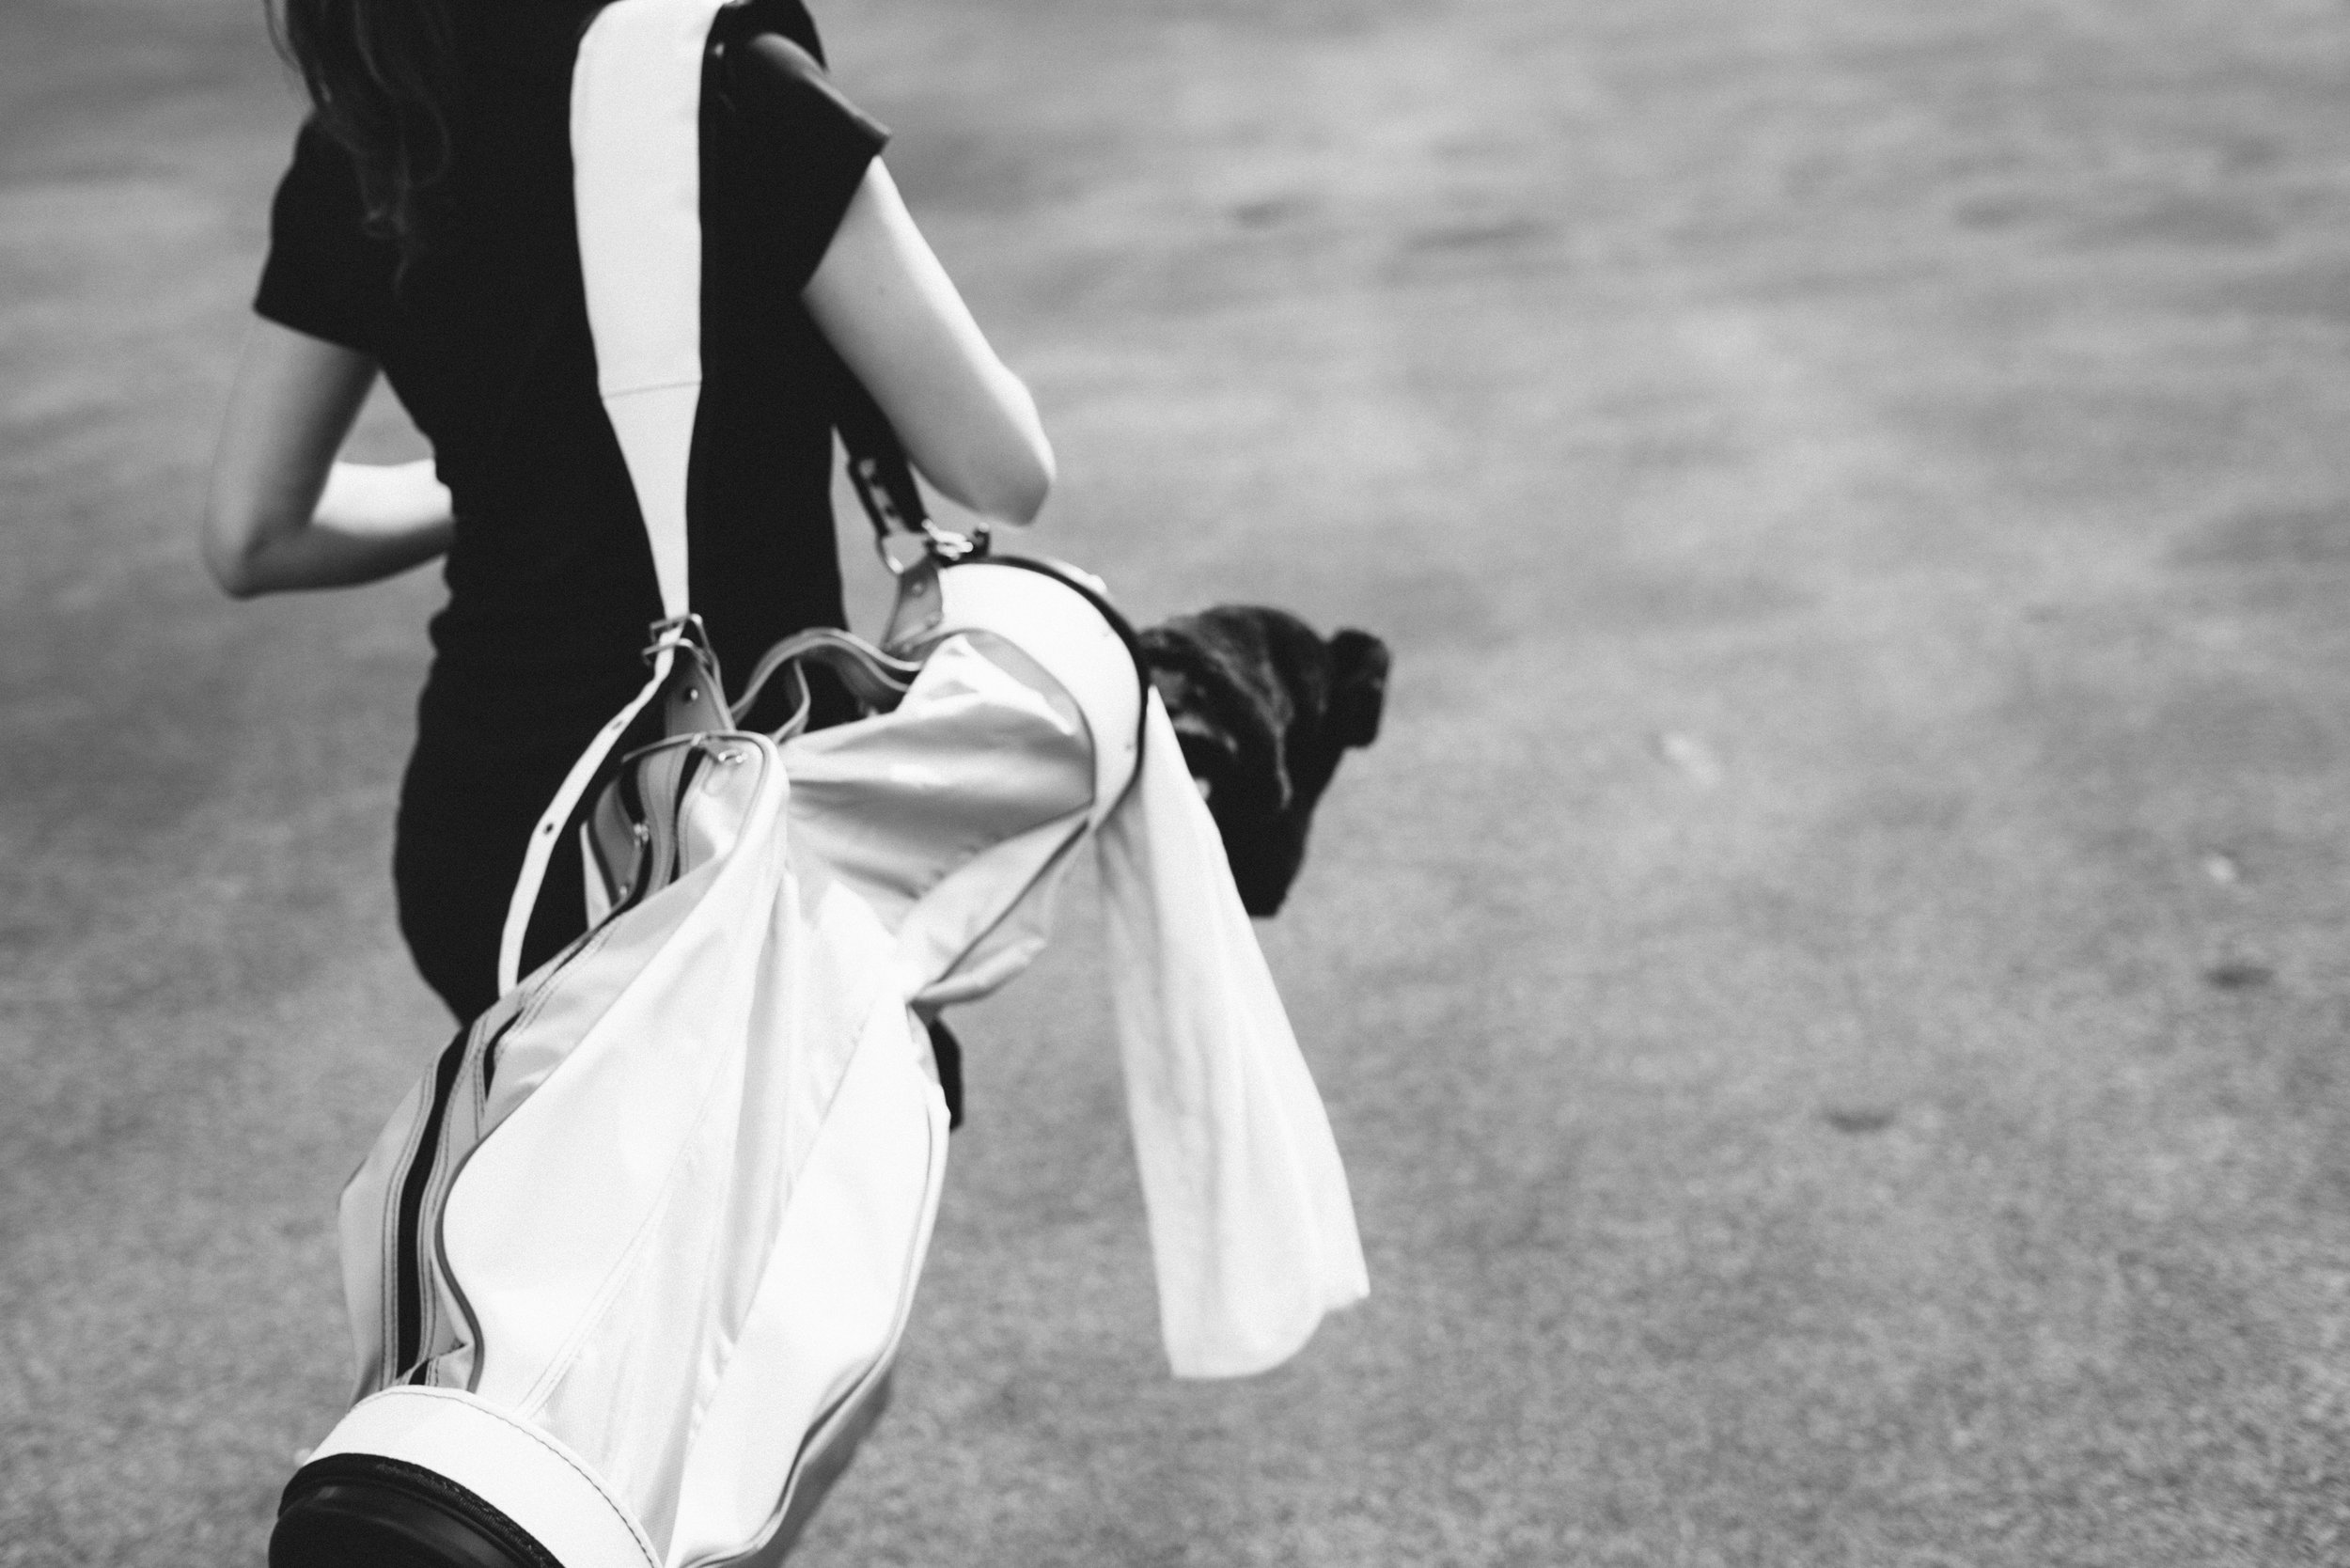 Jones Golf Bags - The everyman bag